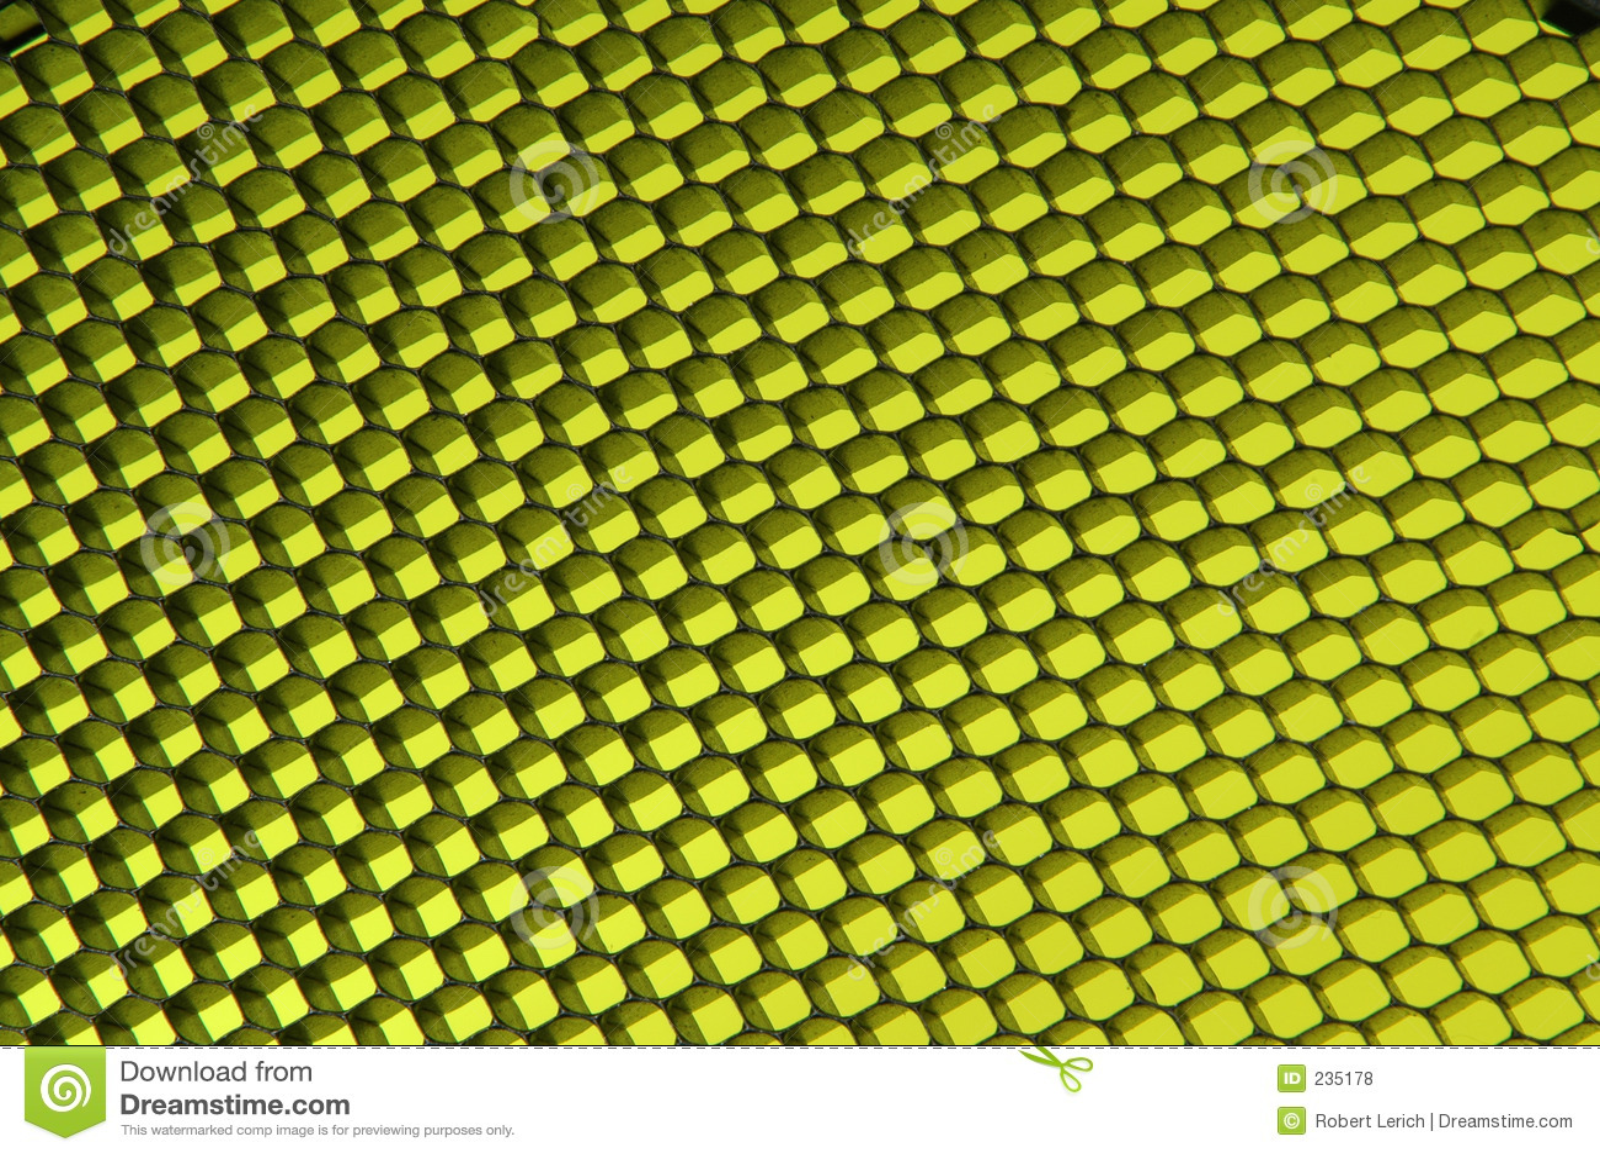 Black mönsan yellow